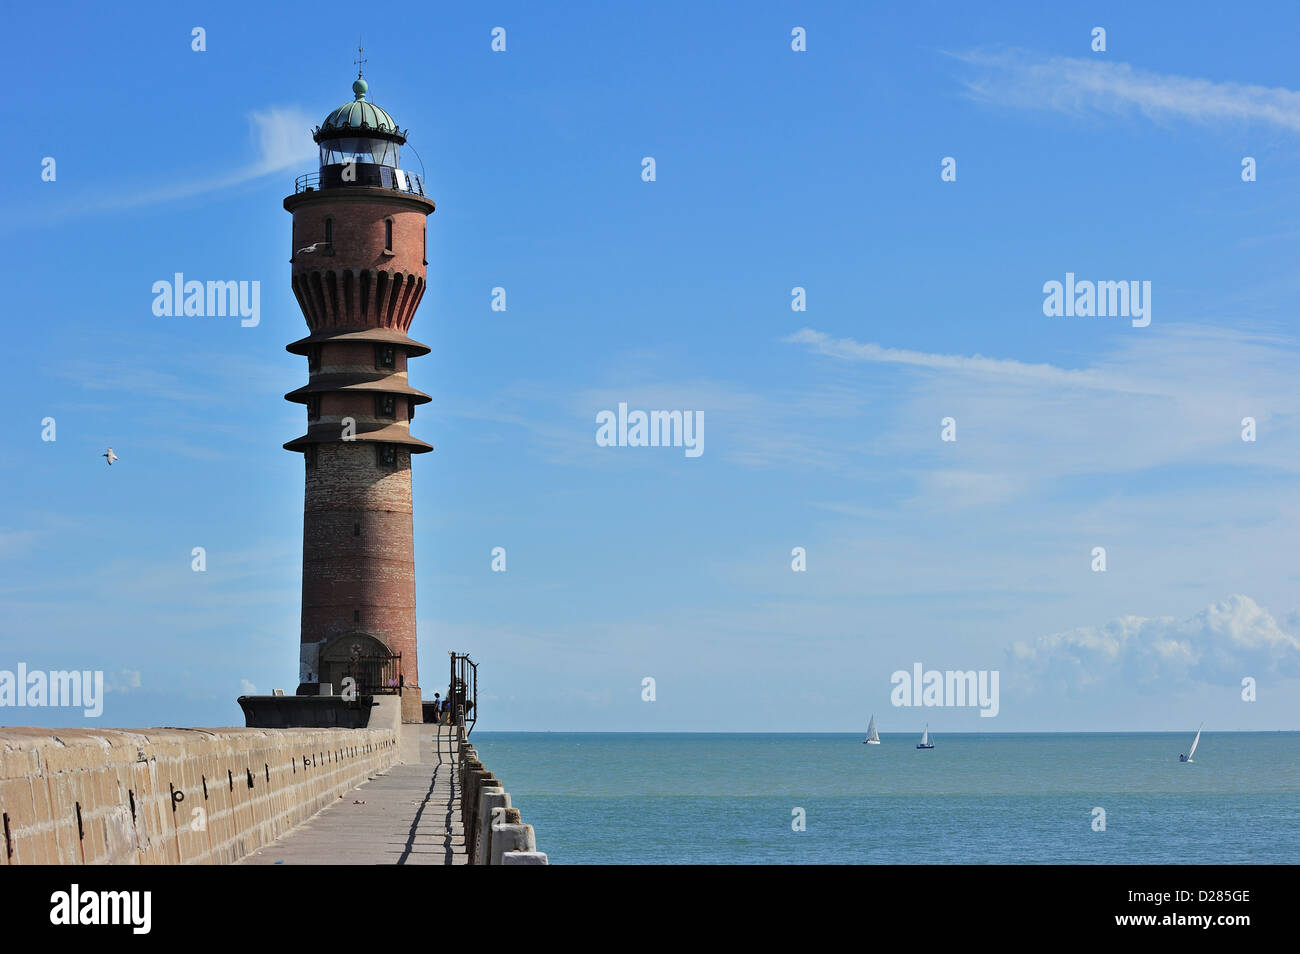 The lighthouse Feu de Saint-Pol at Dunkirk / Dunkerque, Nord-Pas-de-Calais, France - Stock Image